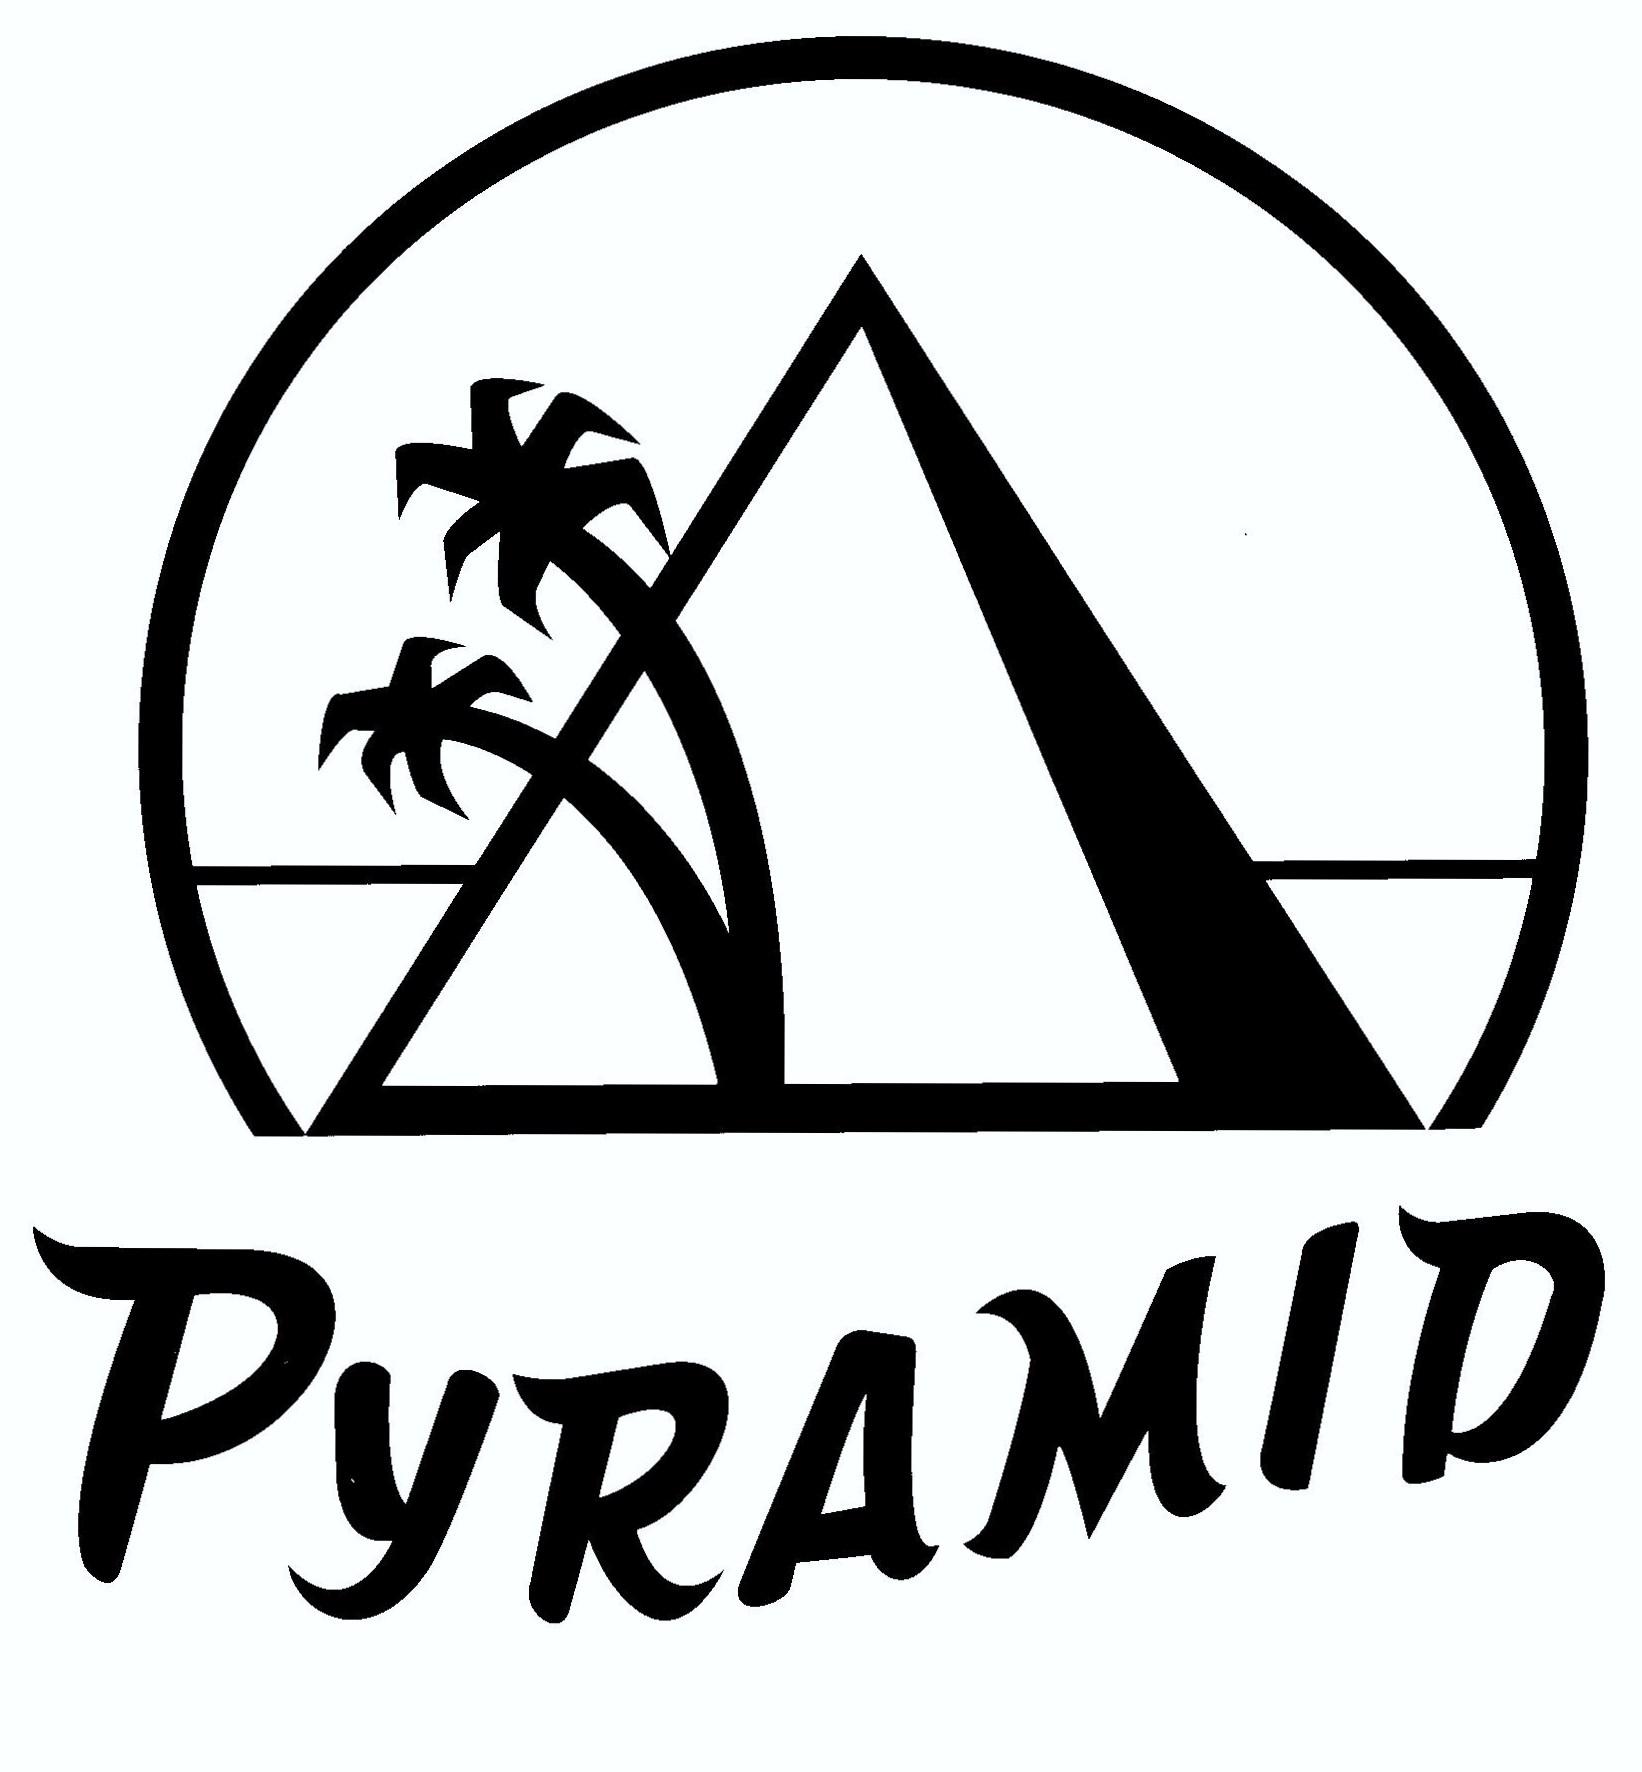 Pyramid Logo I - Kopie